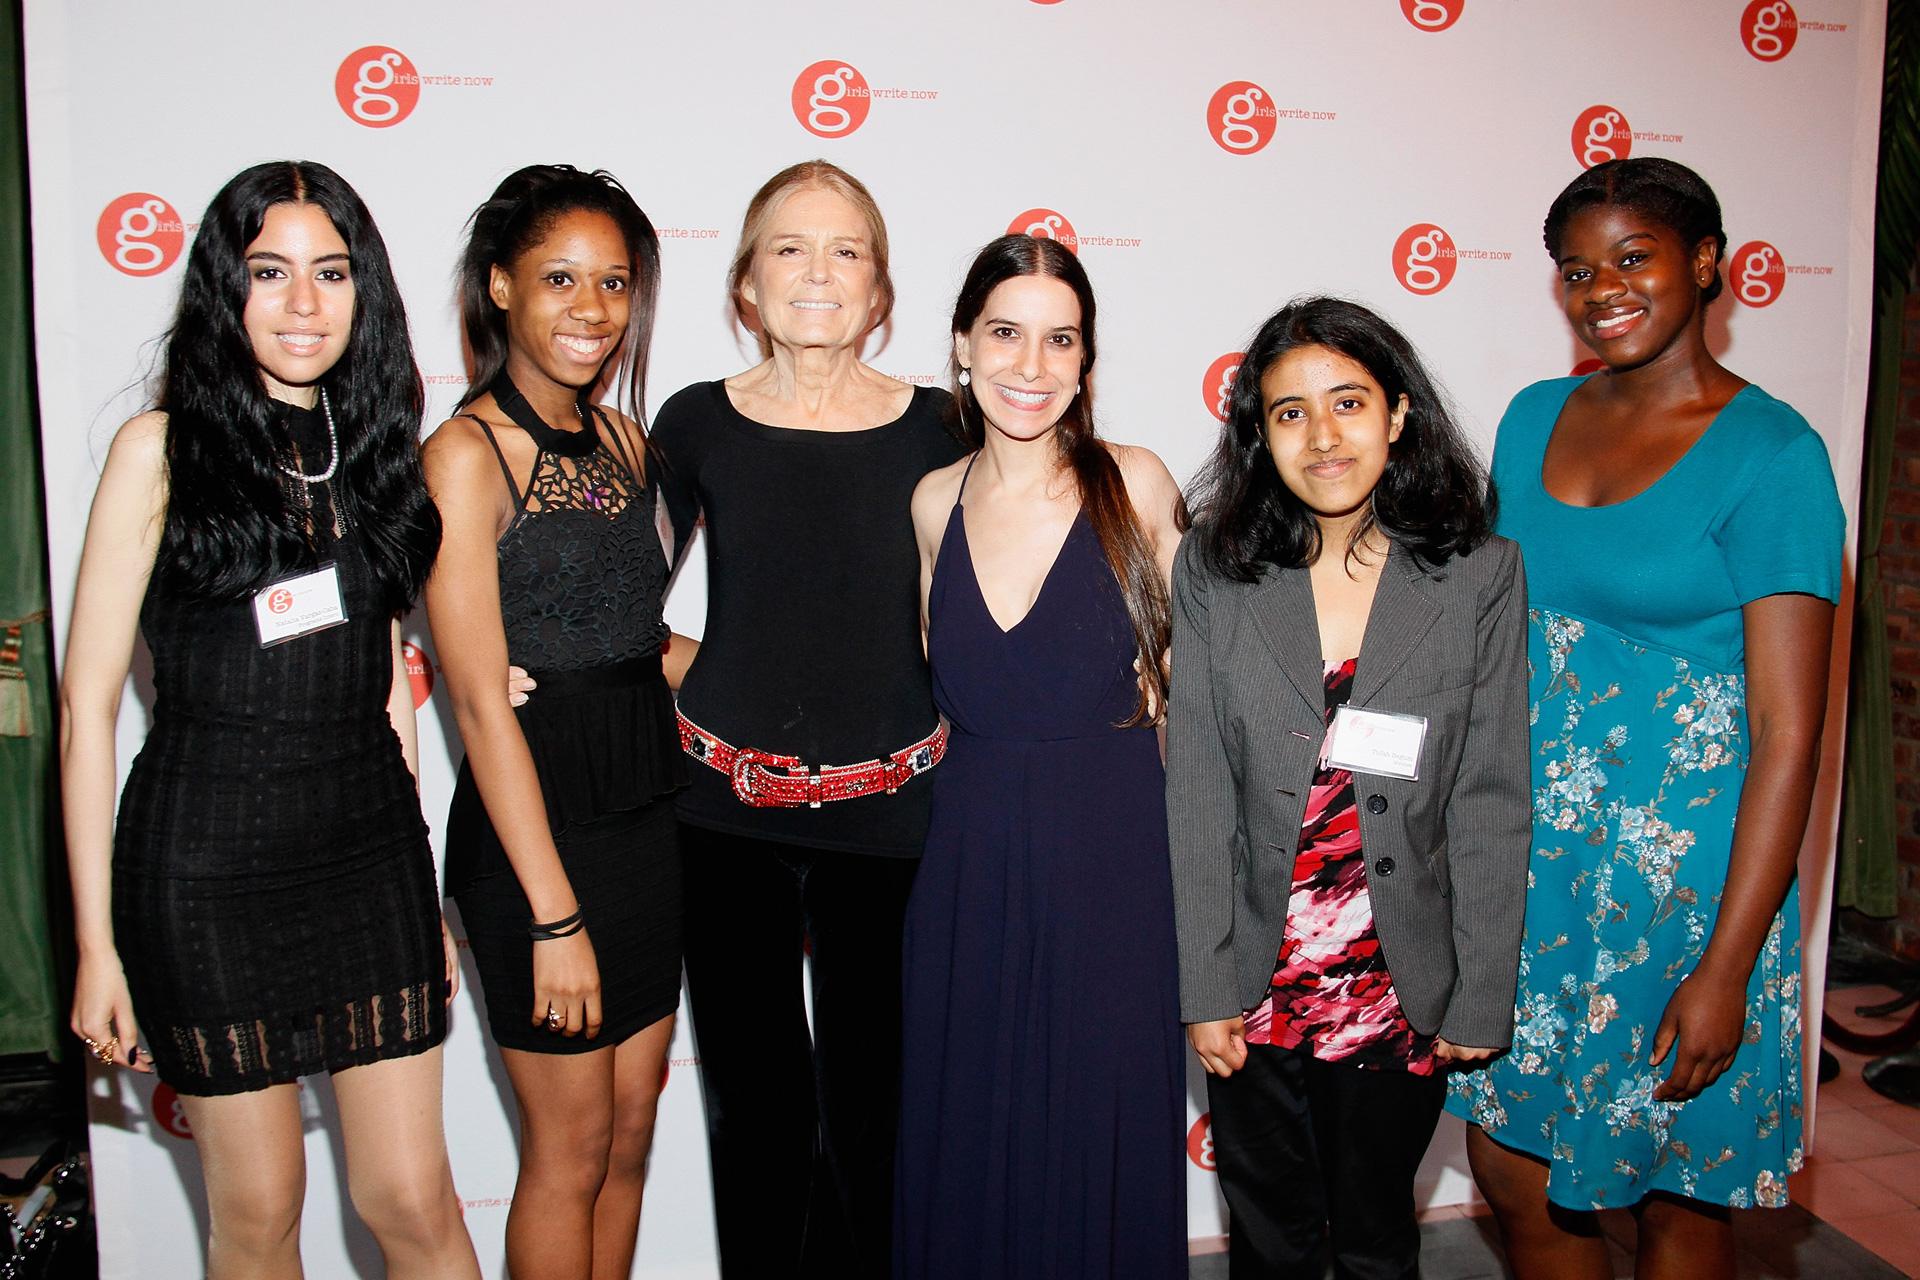 Girls Write Now gala honoring Gloria Steinem